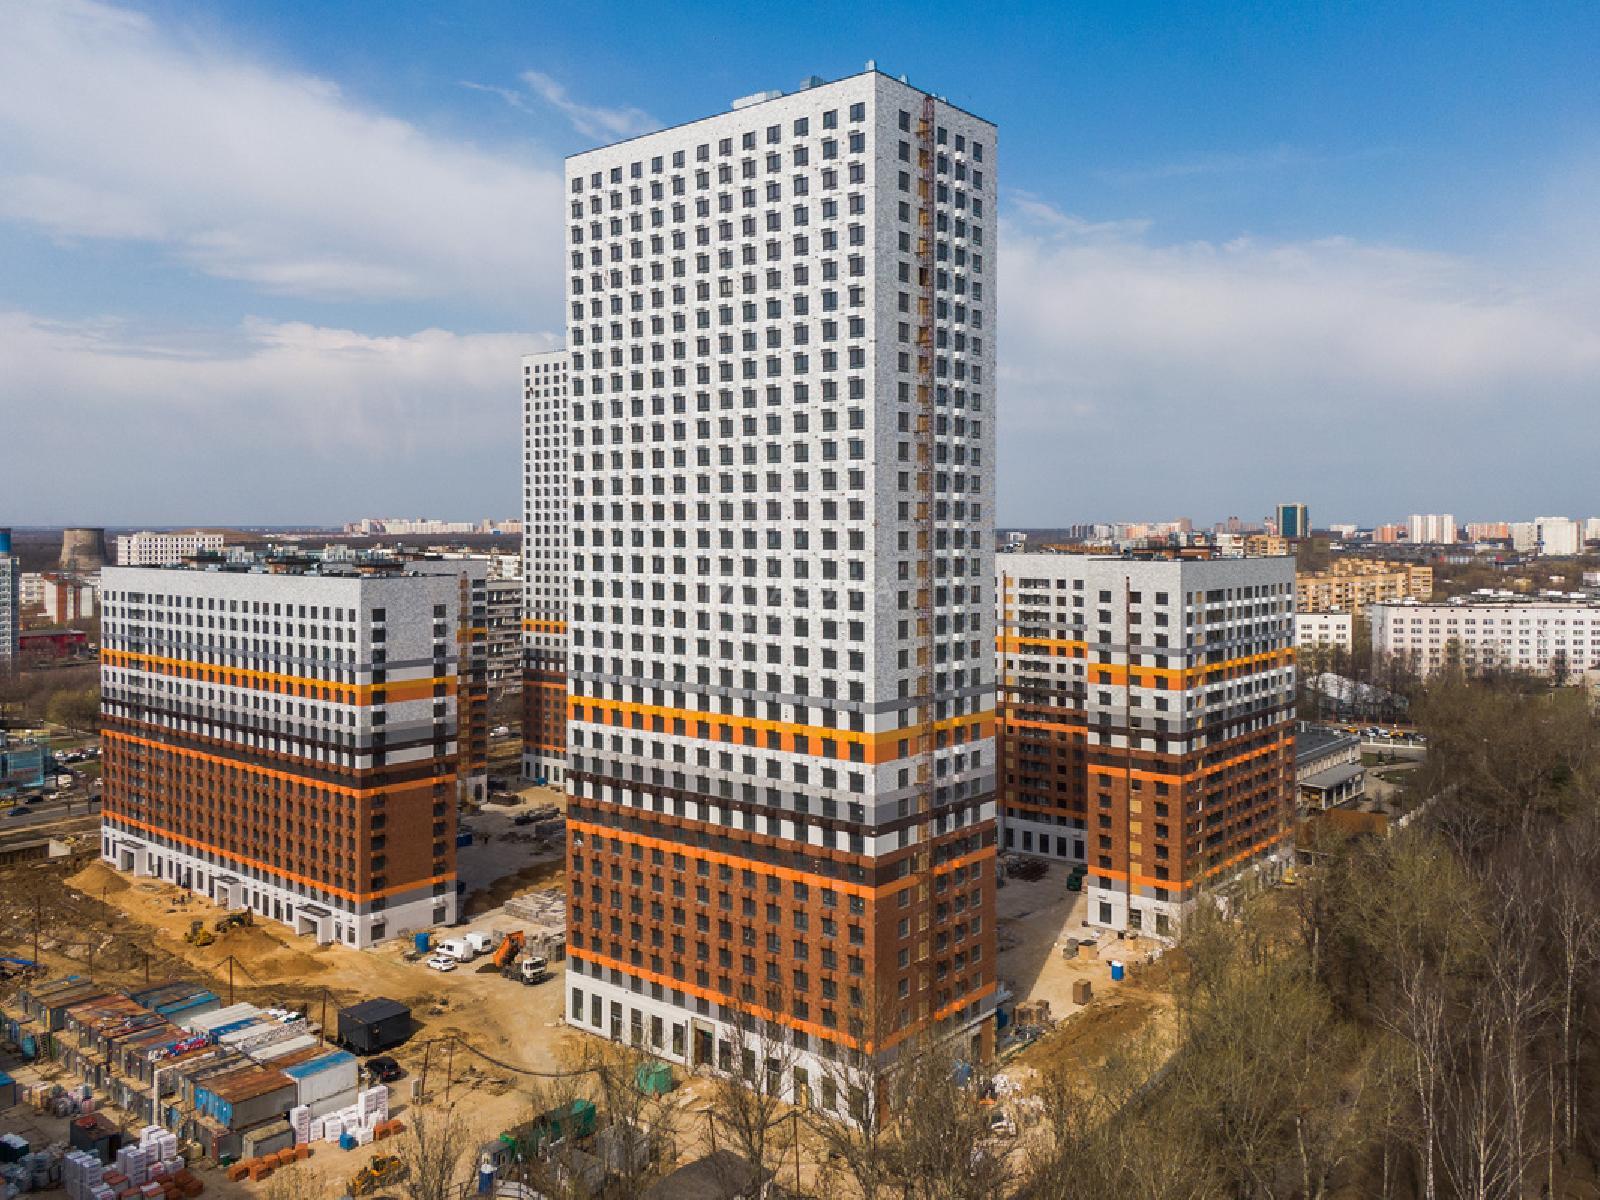 Фото №4 - 1-комнатная квартира, Москва, Лобненская улица 13 корпус 2, метро Селигерская